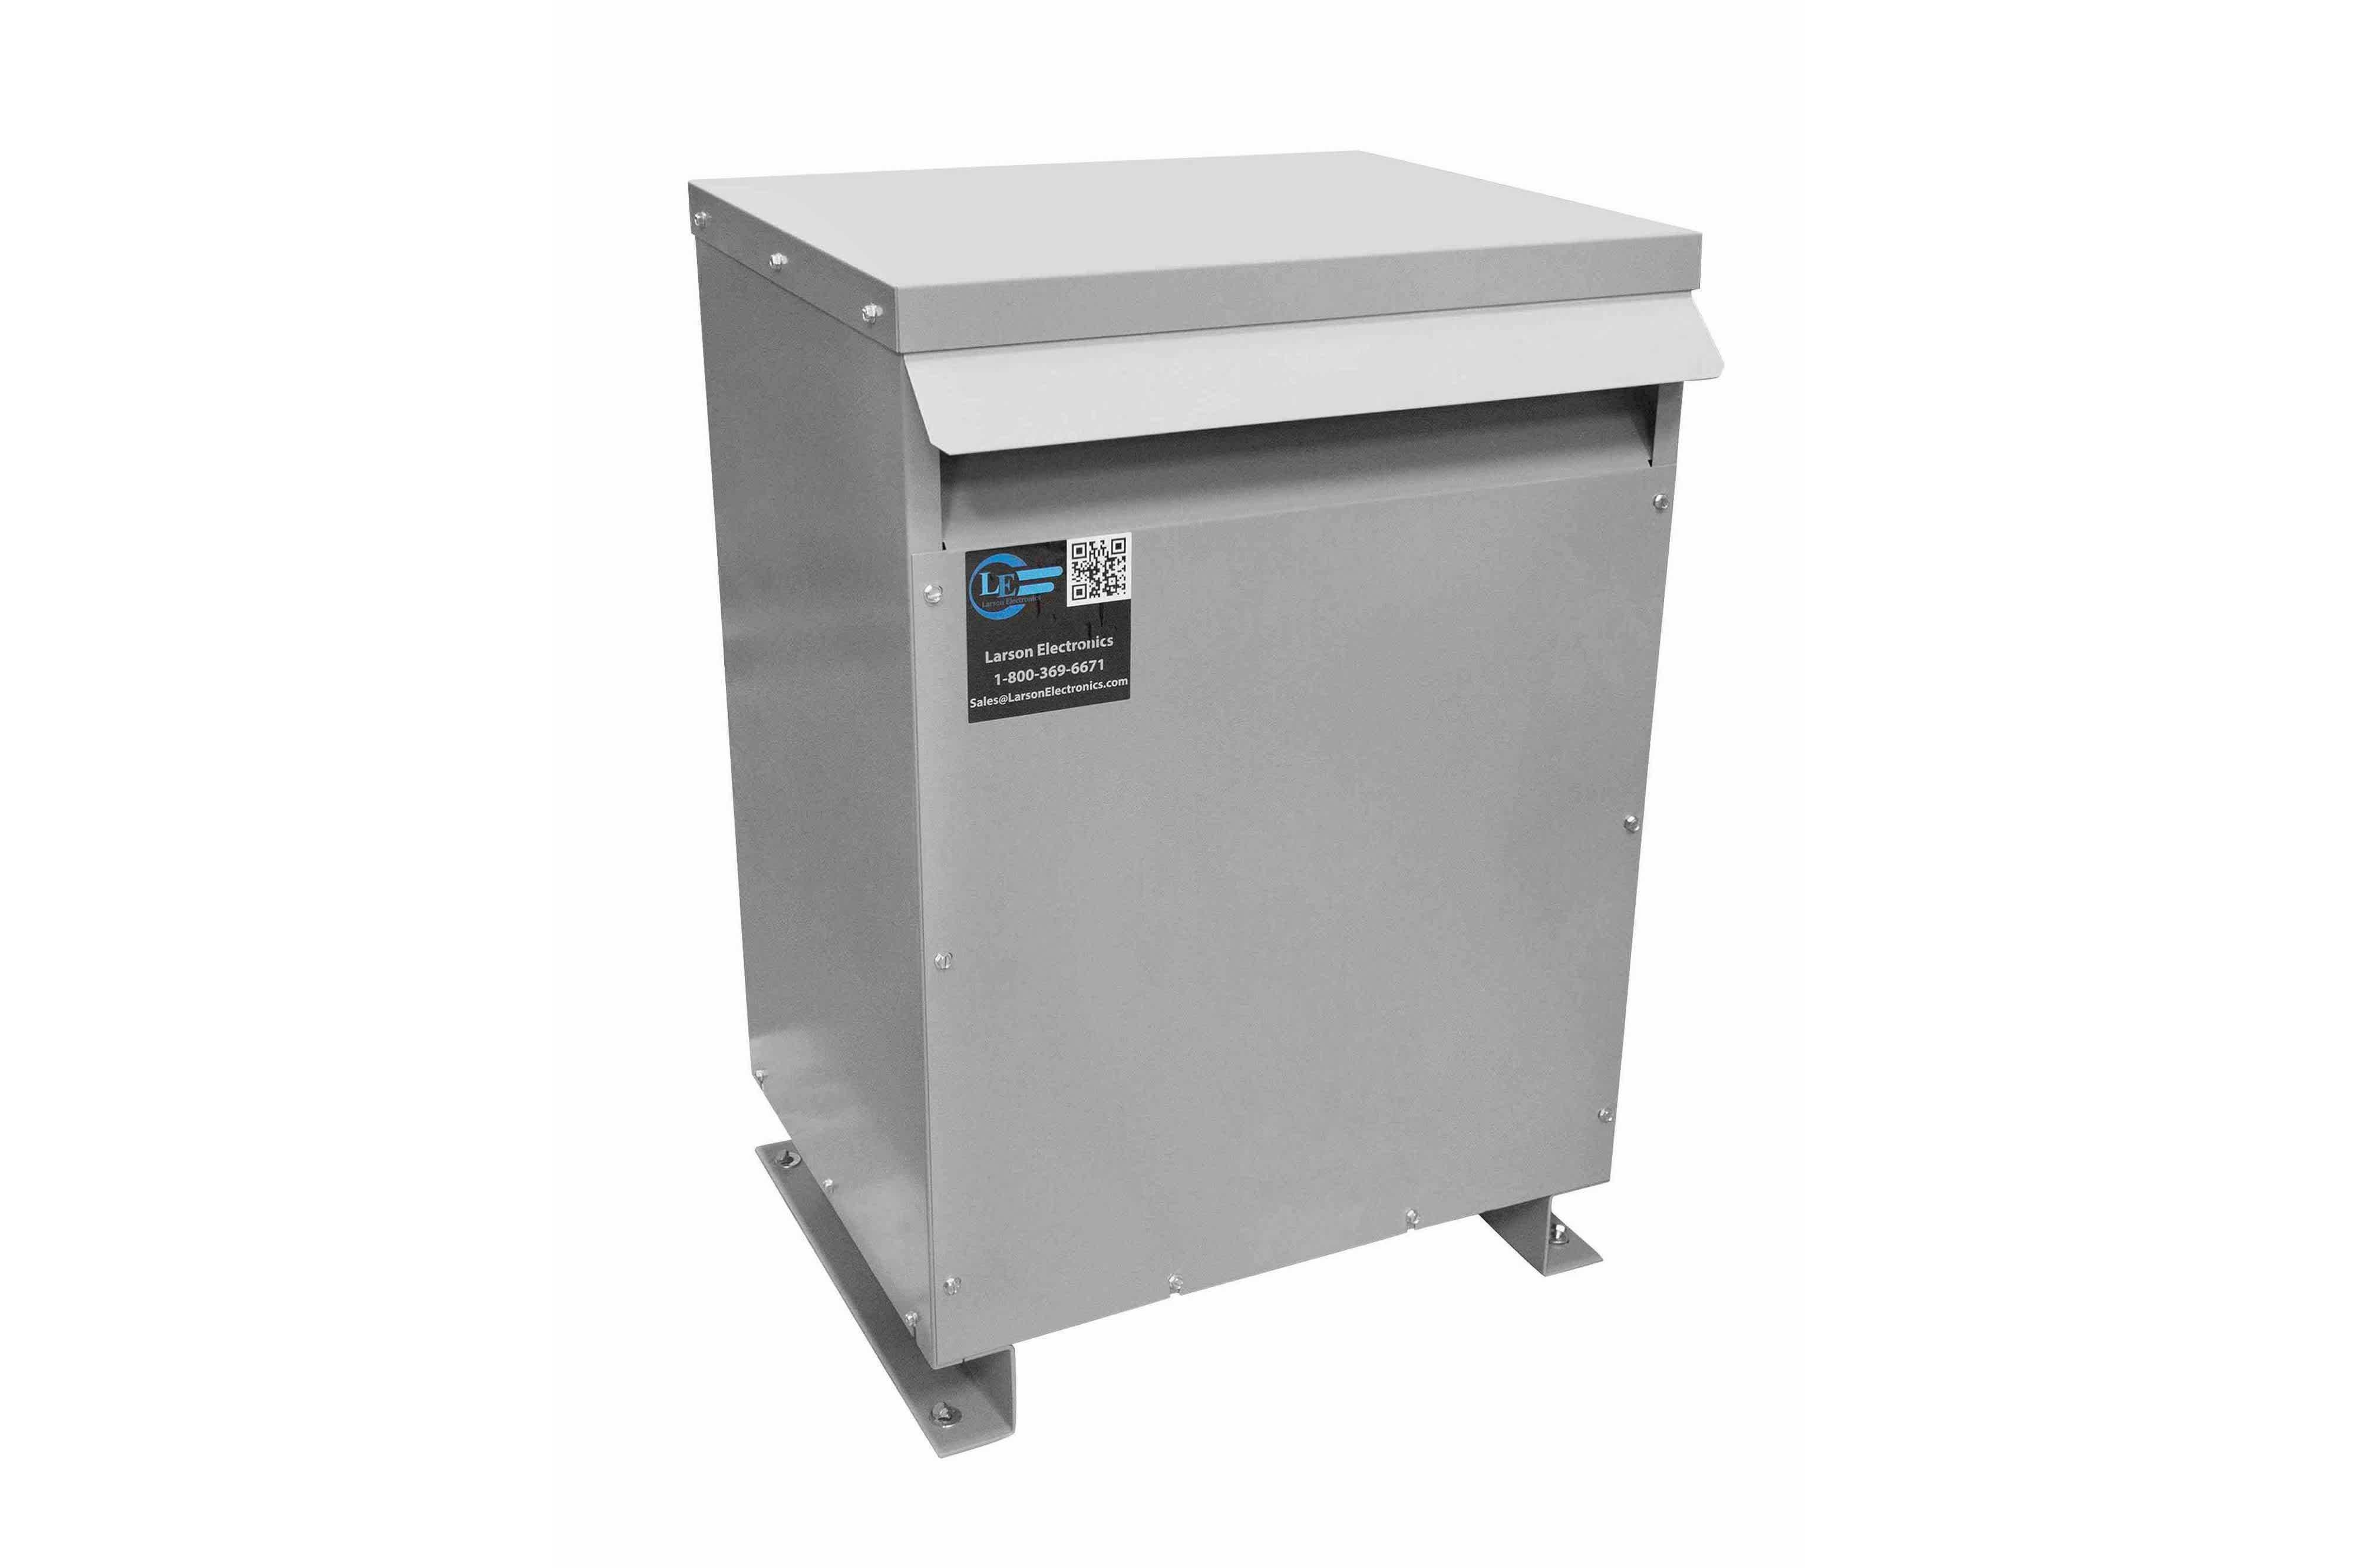 167 kVA 3PH Isolation Transformer, 600V Wye Primary, 208V Delta Secondary, N3R, Ventilated, 60 Hz